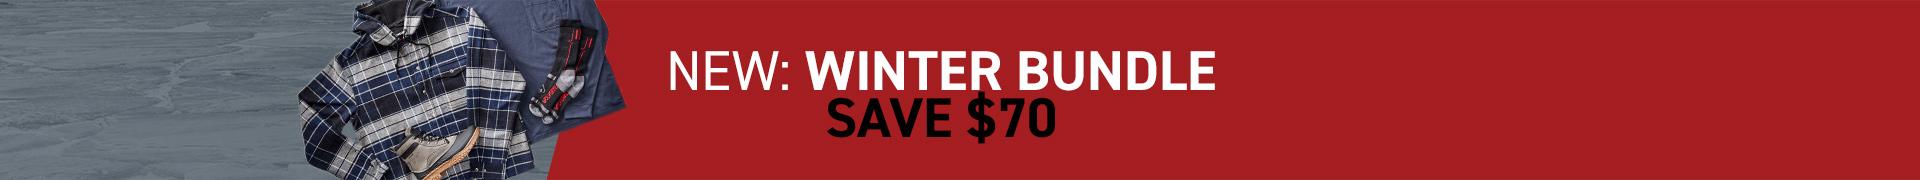 New winter bundle. Save $70.